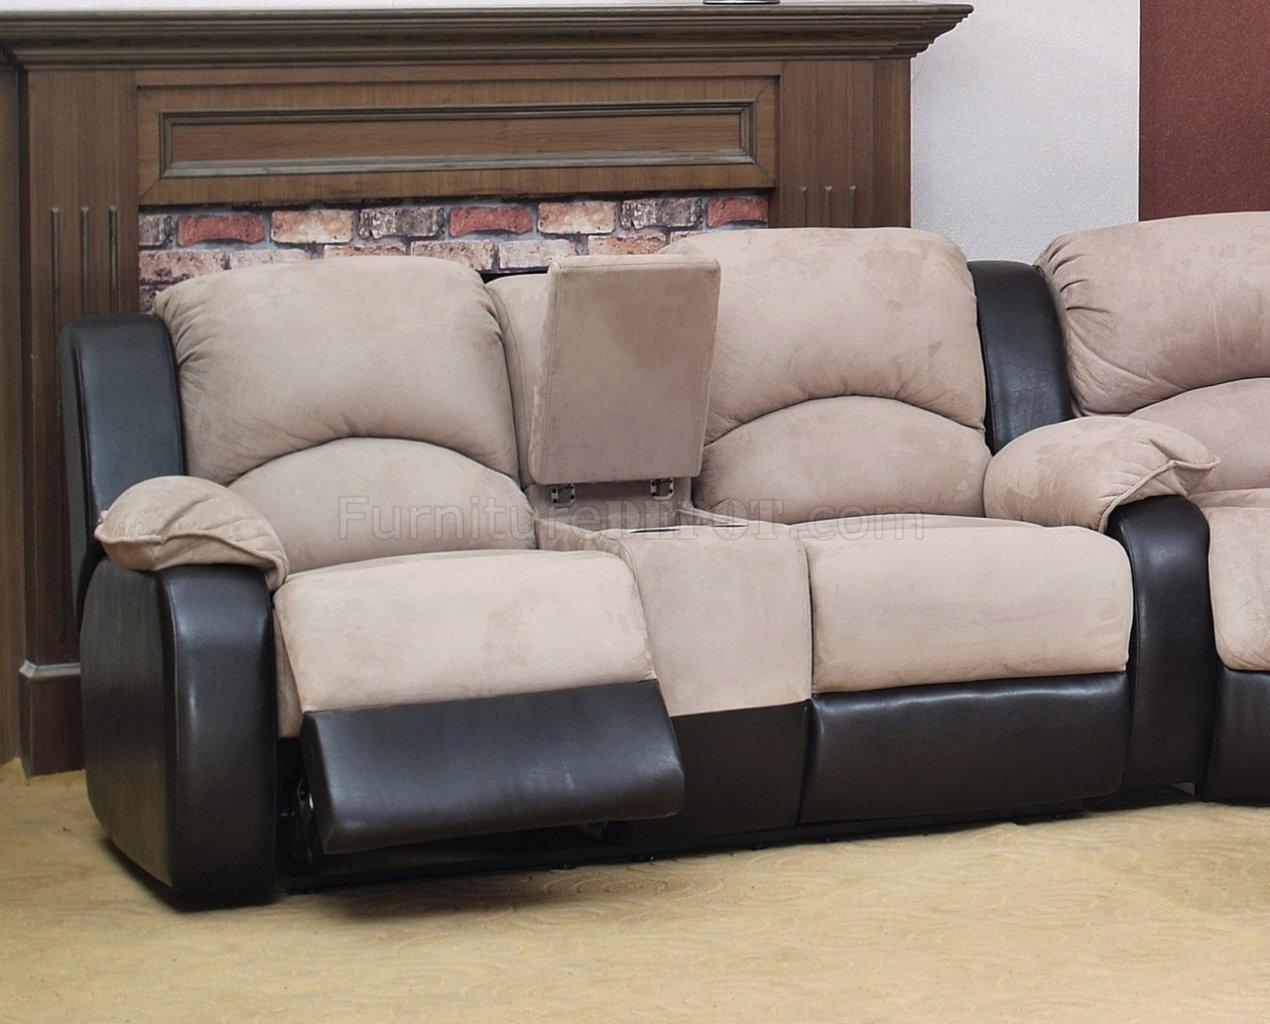 Beige Fabric Modern Reclining Sectional Sofa wOptional Chair